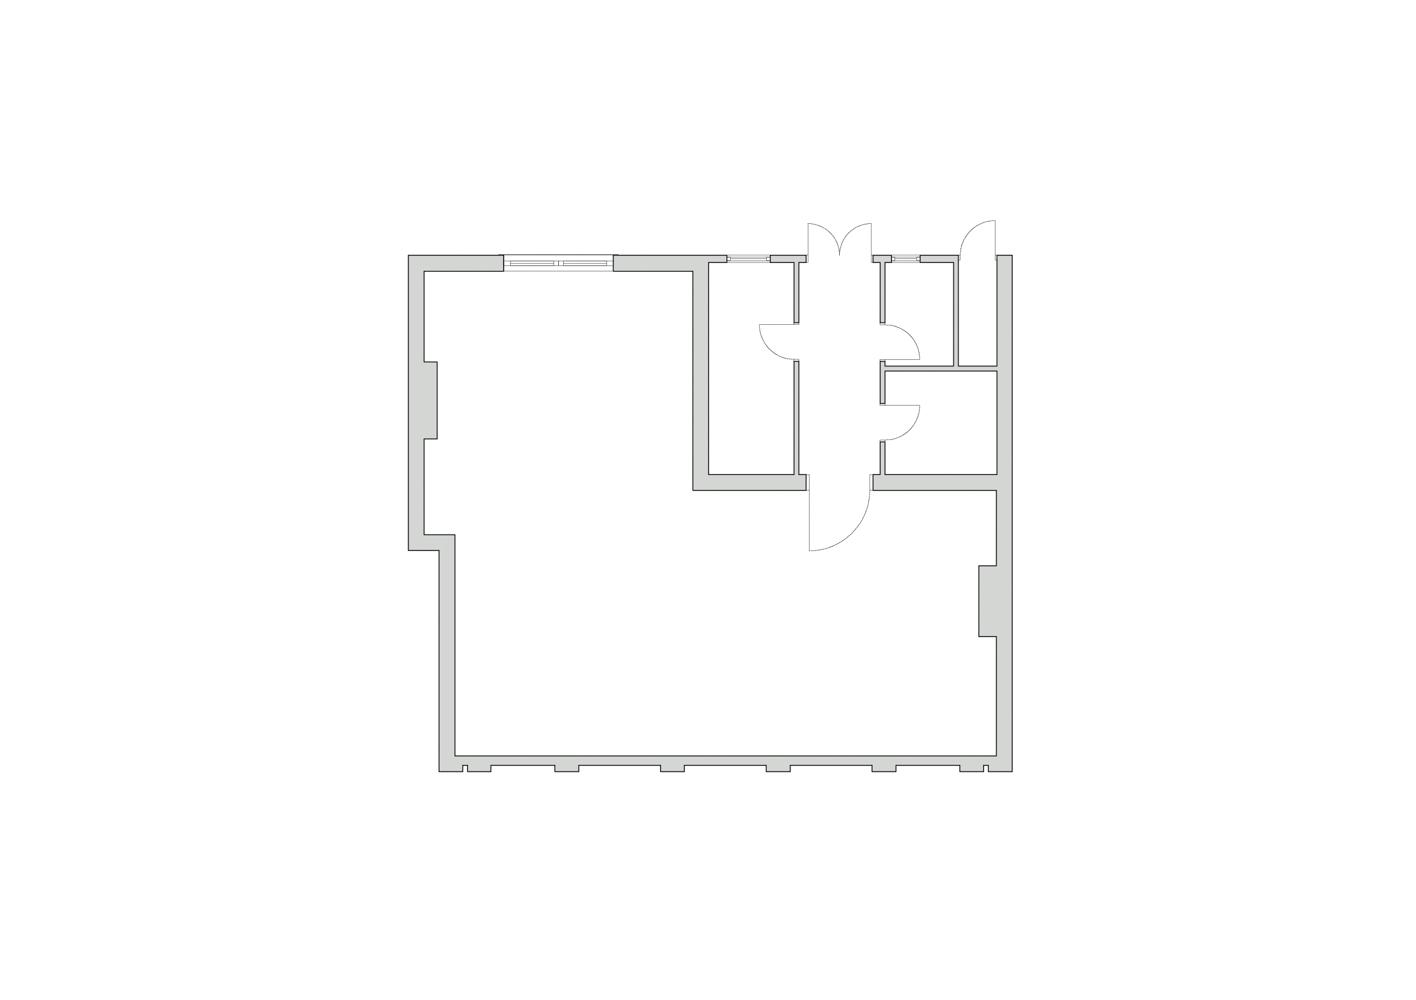 defoe-road-paper-house-project-the-design-emotive-25.jpg